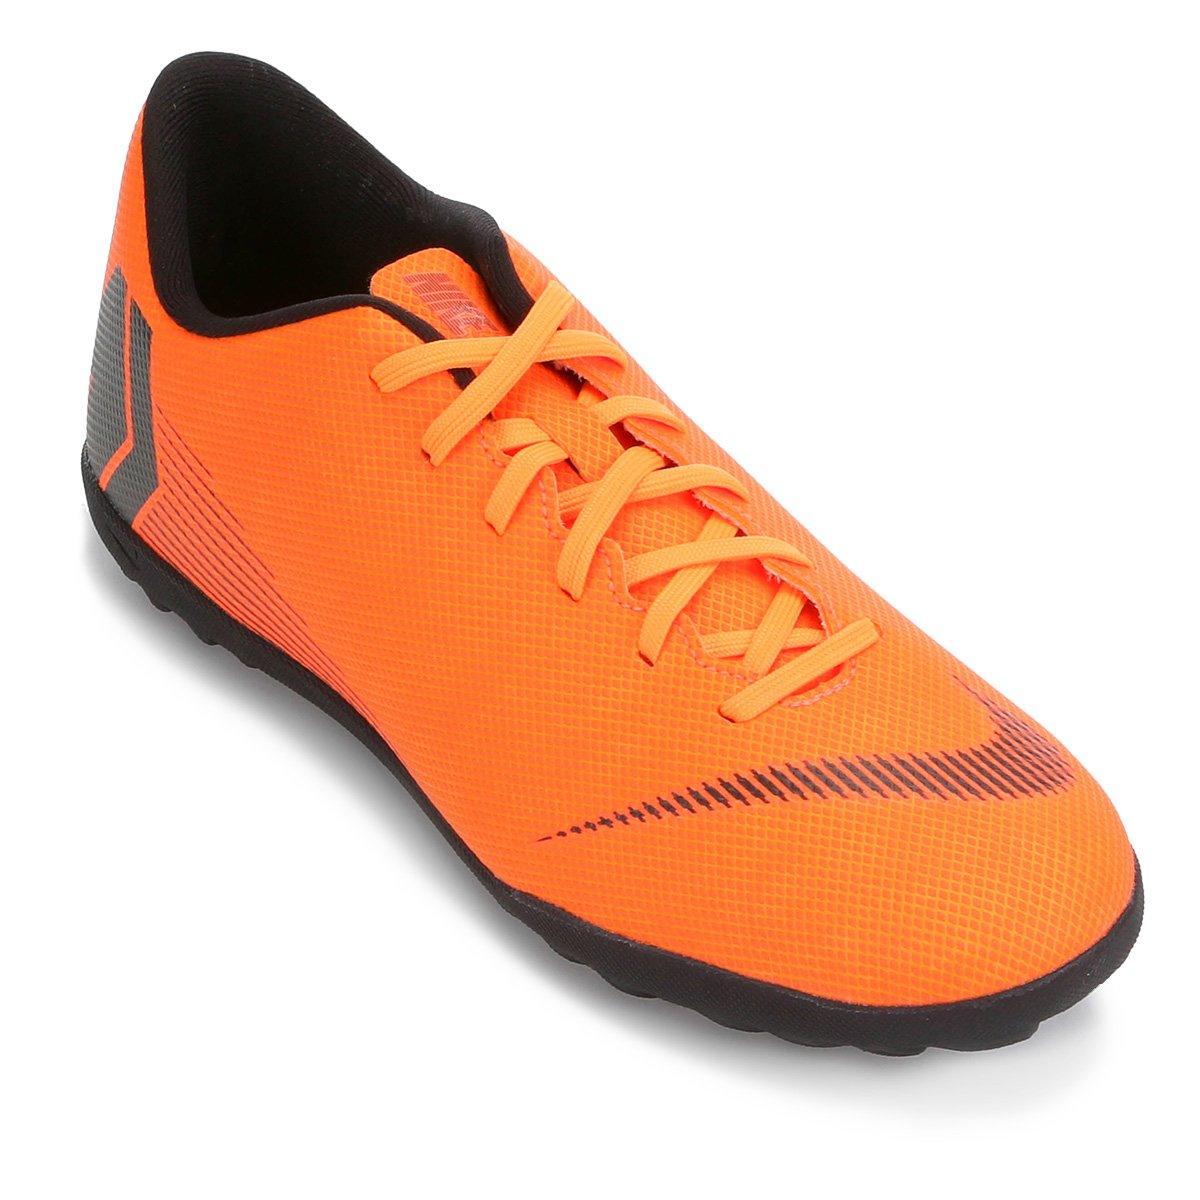 Chuteira Nike Society Mercurial Vapor 12 Club - Laranja e Preto ... 0068f485ad3e5